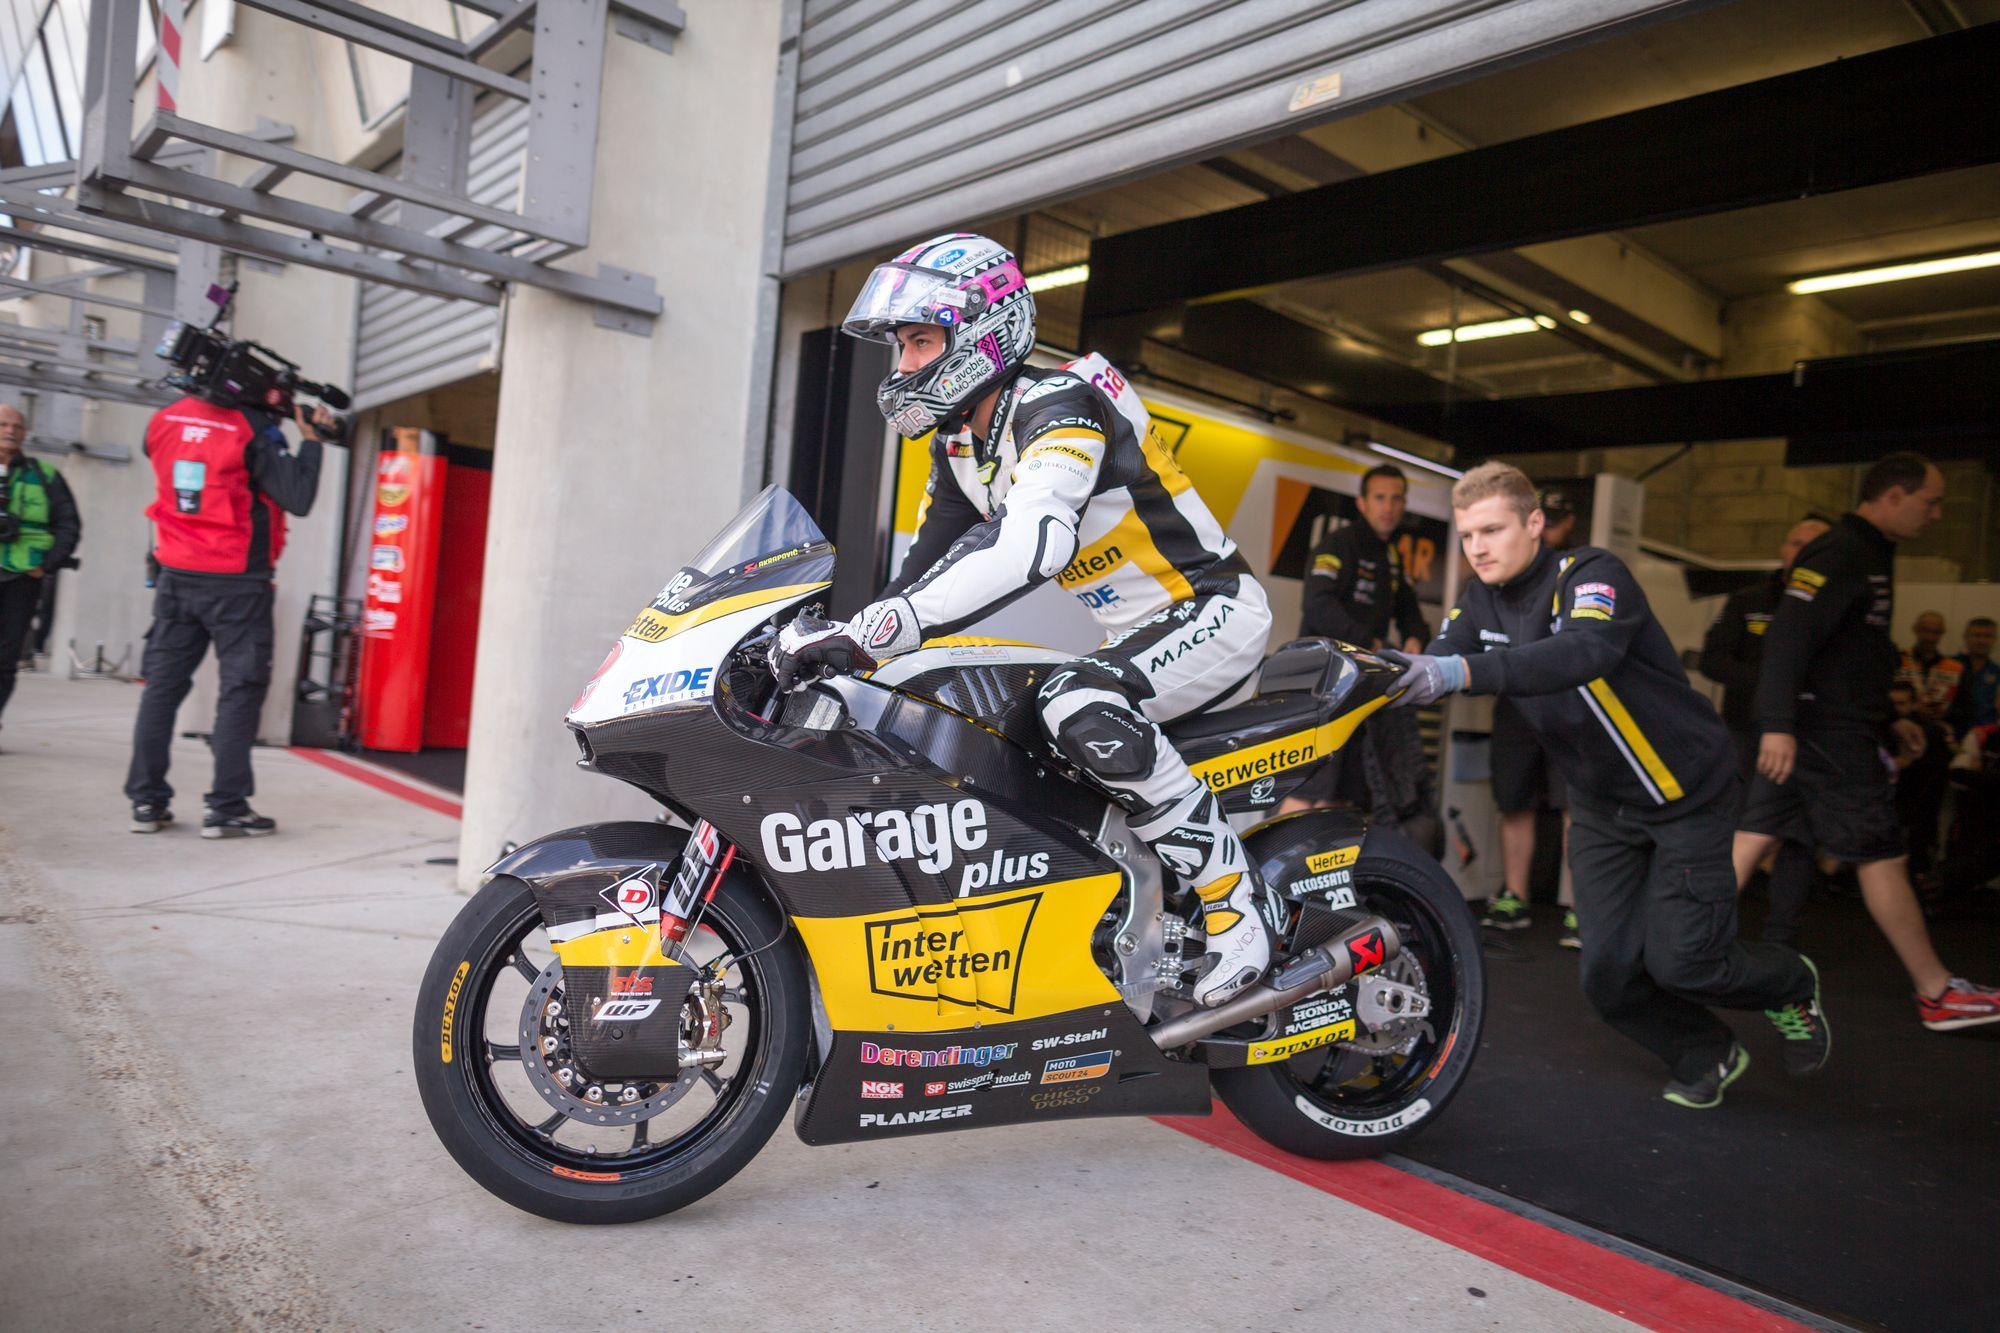 GP France-Moto2: Morbidelli au sommet